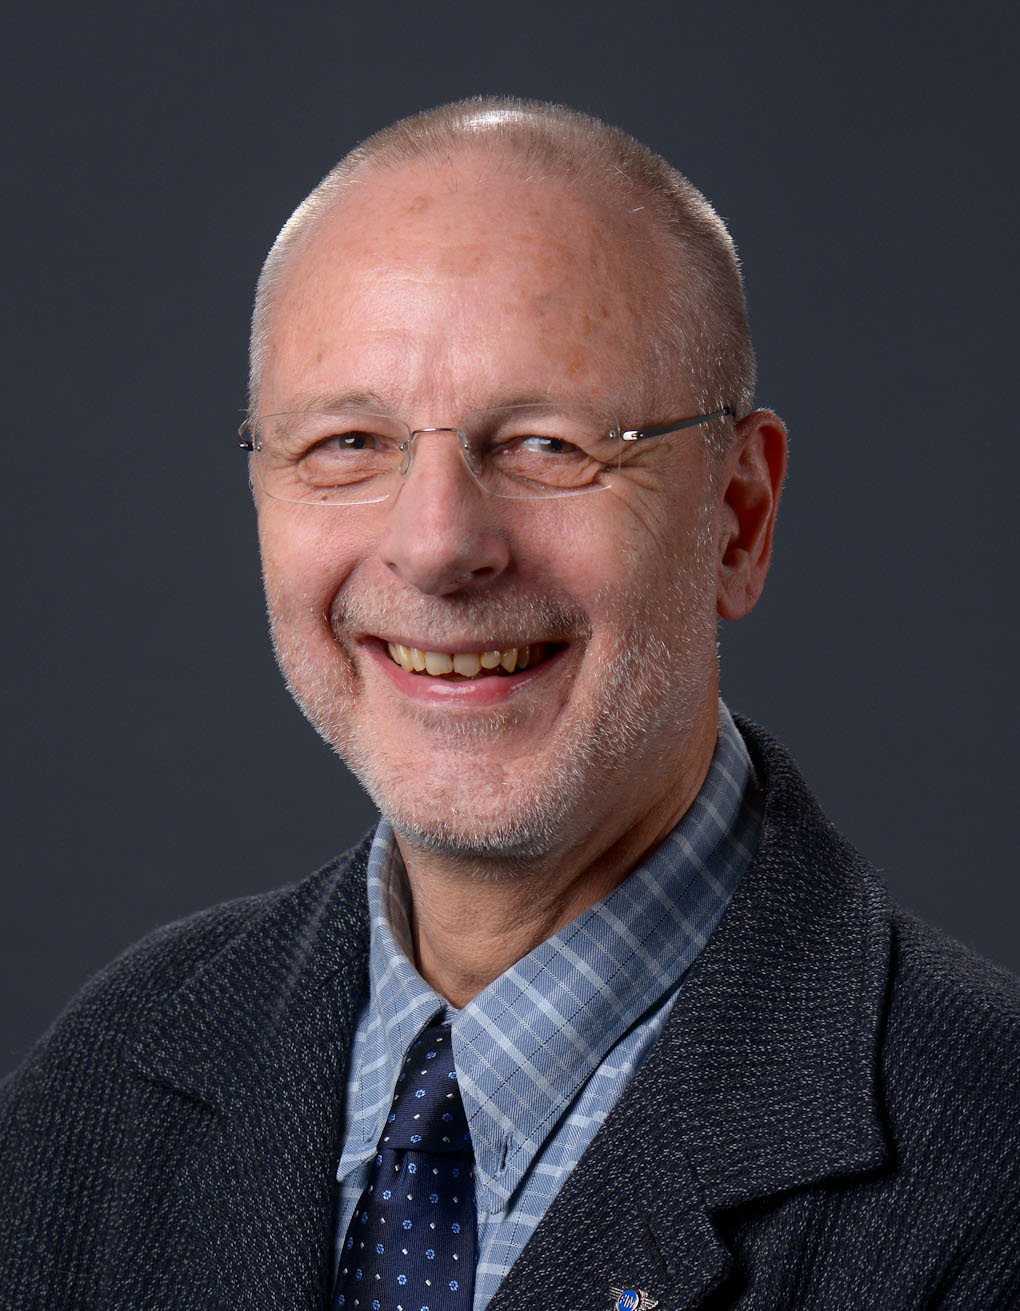 Finn Kronborg-Mazanti